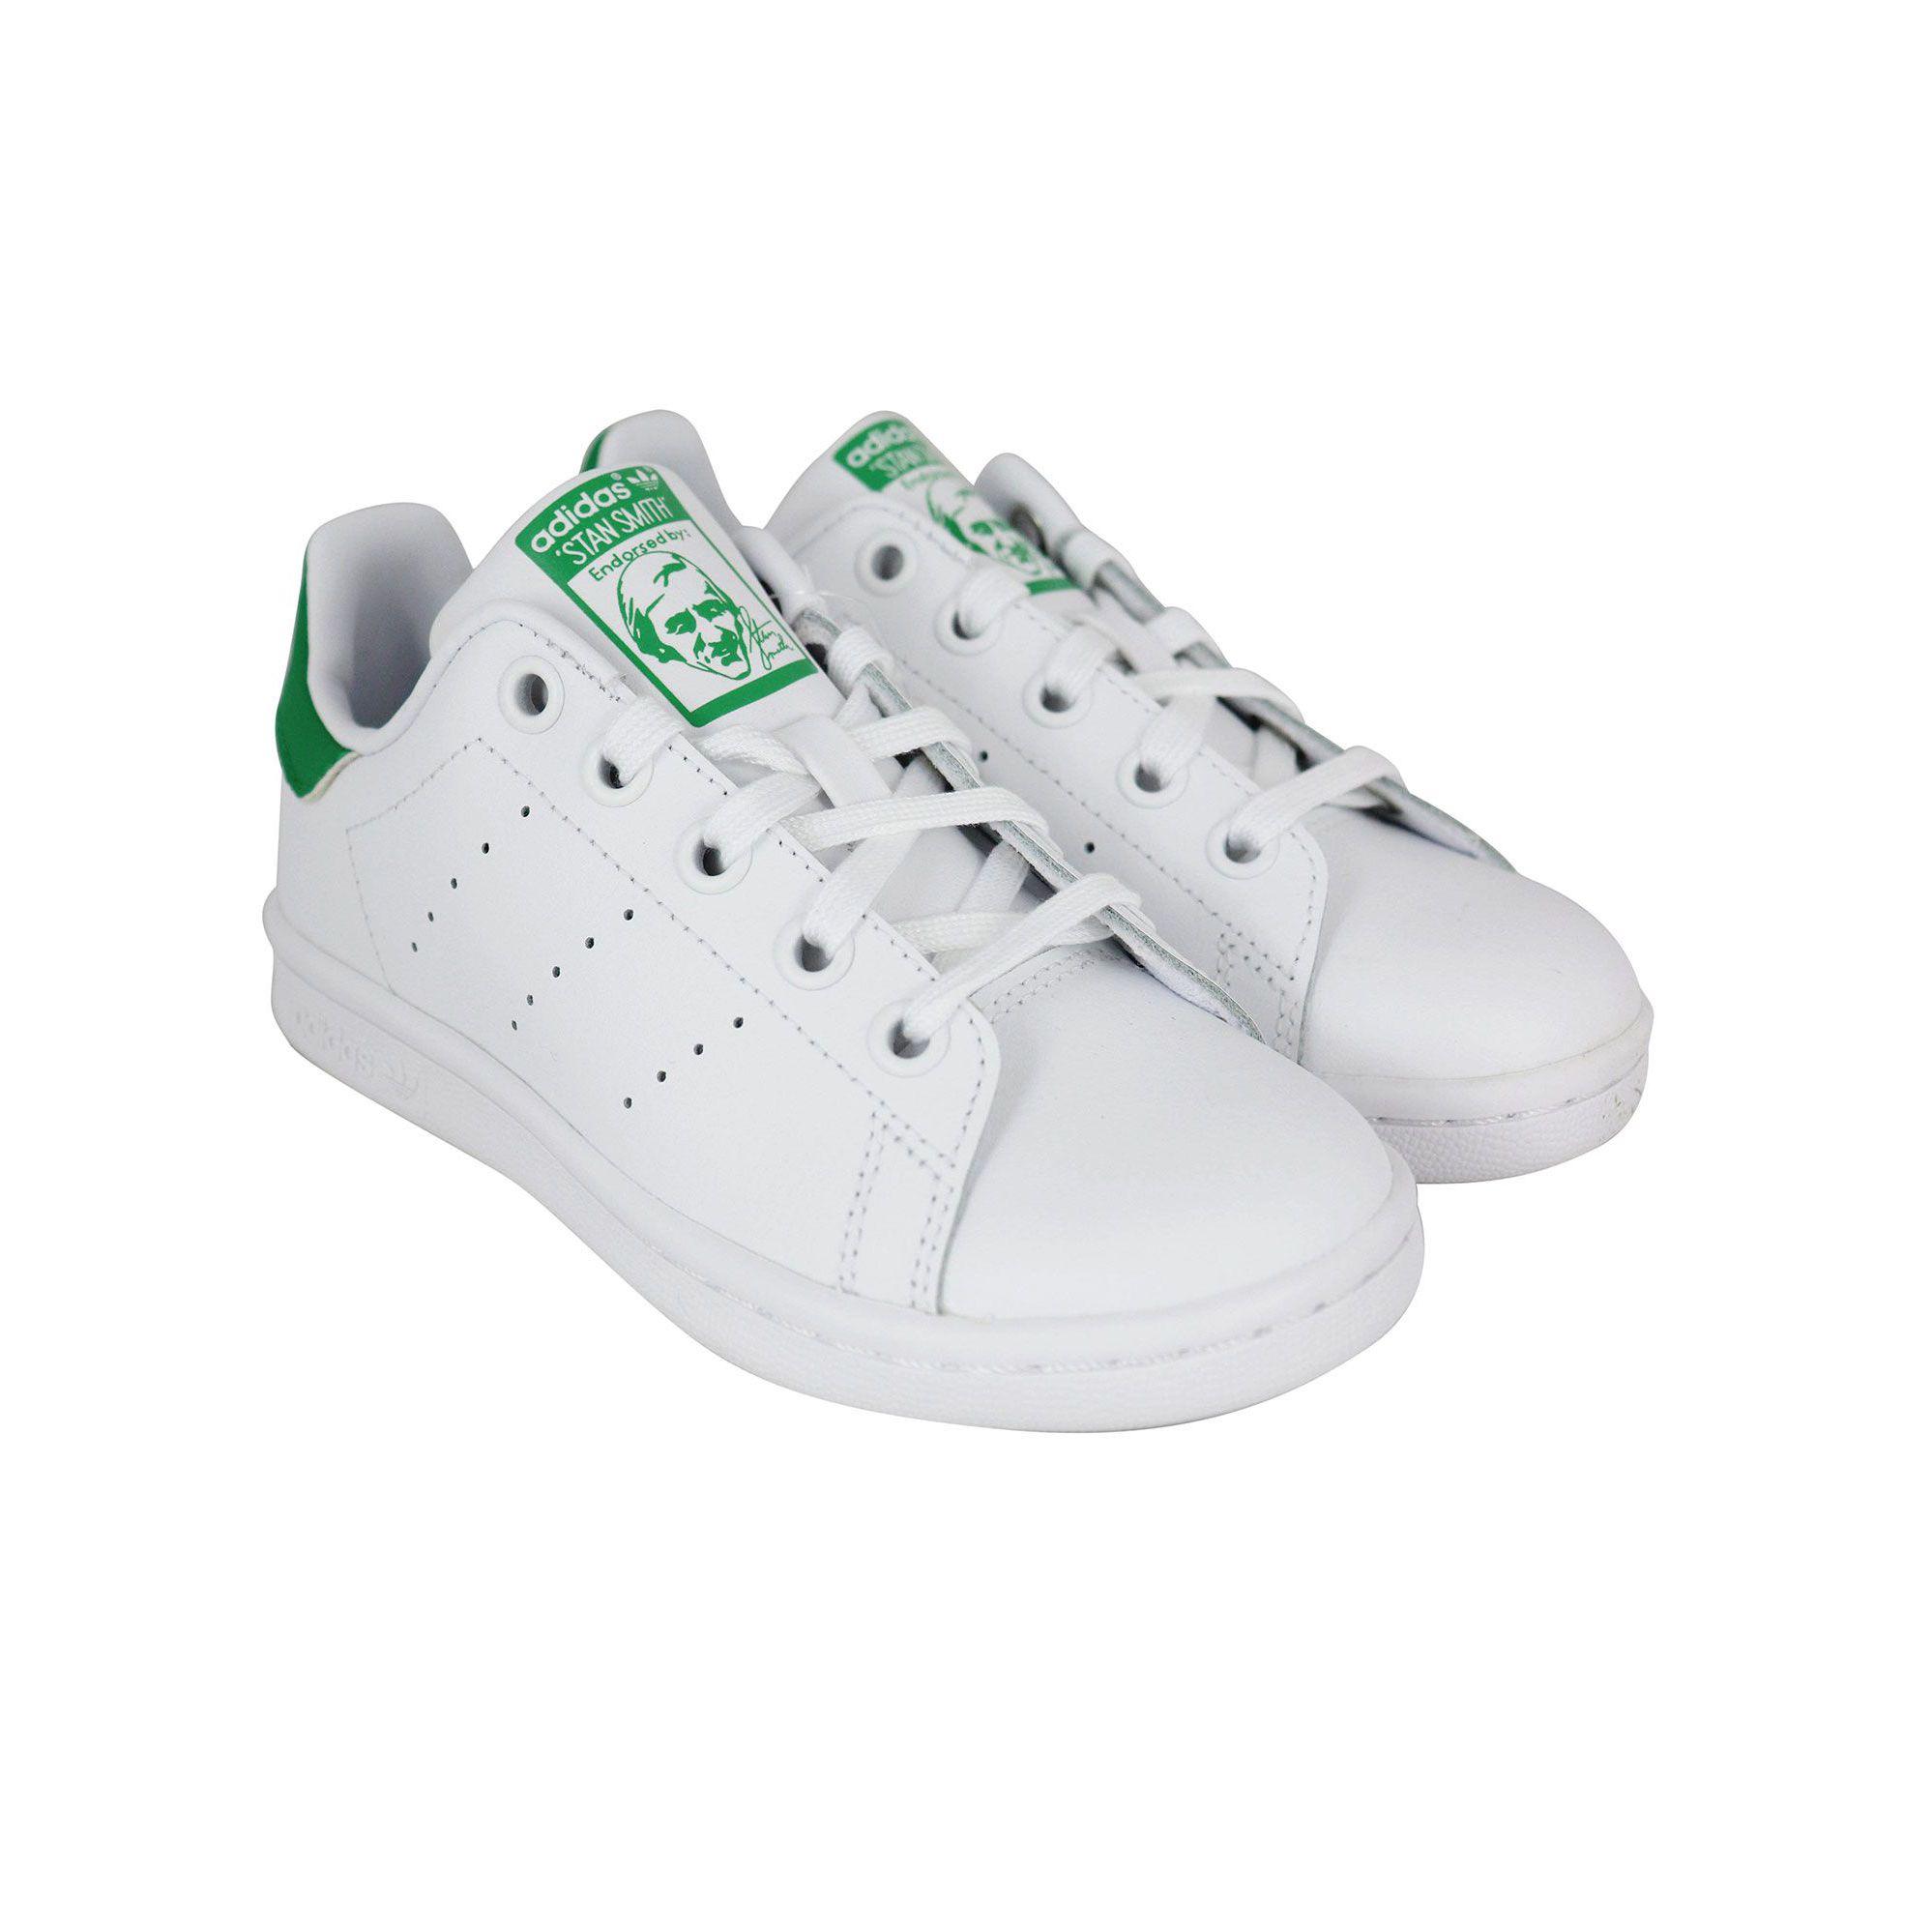 Sneakers BA8375 STAN SMITH Biancoverde, Adidas ba8375 stan